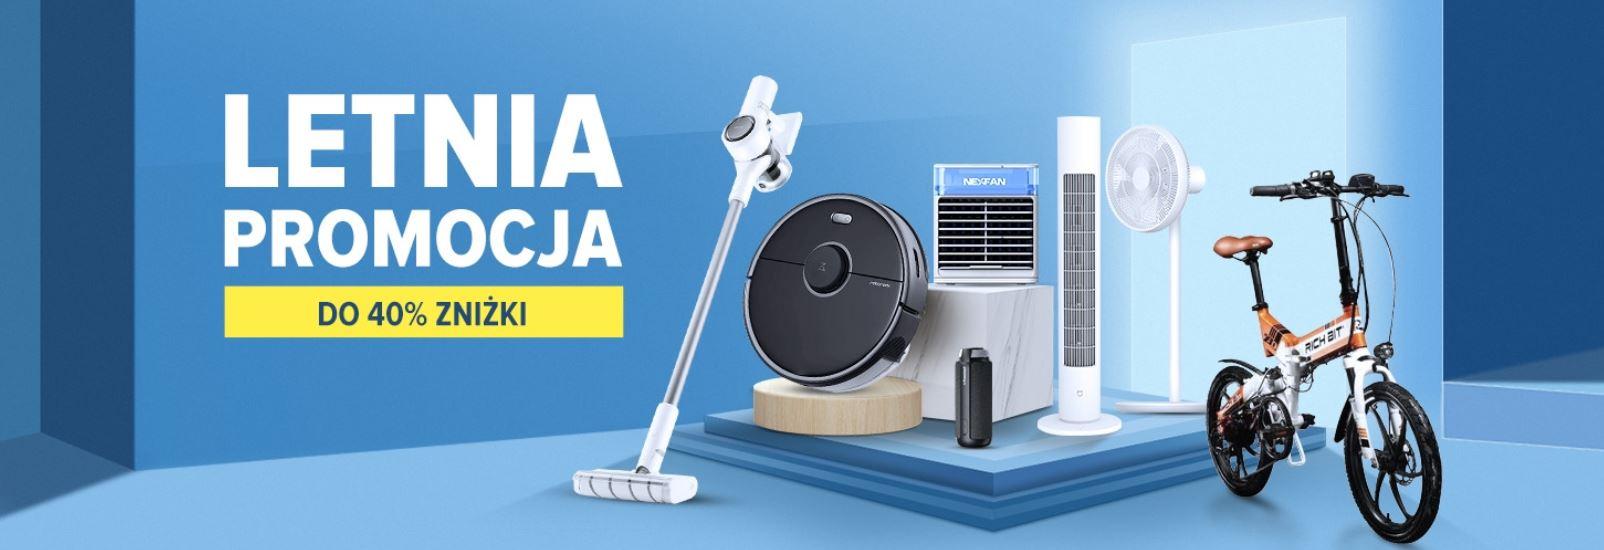 letnia promocja geekbuying PL